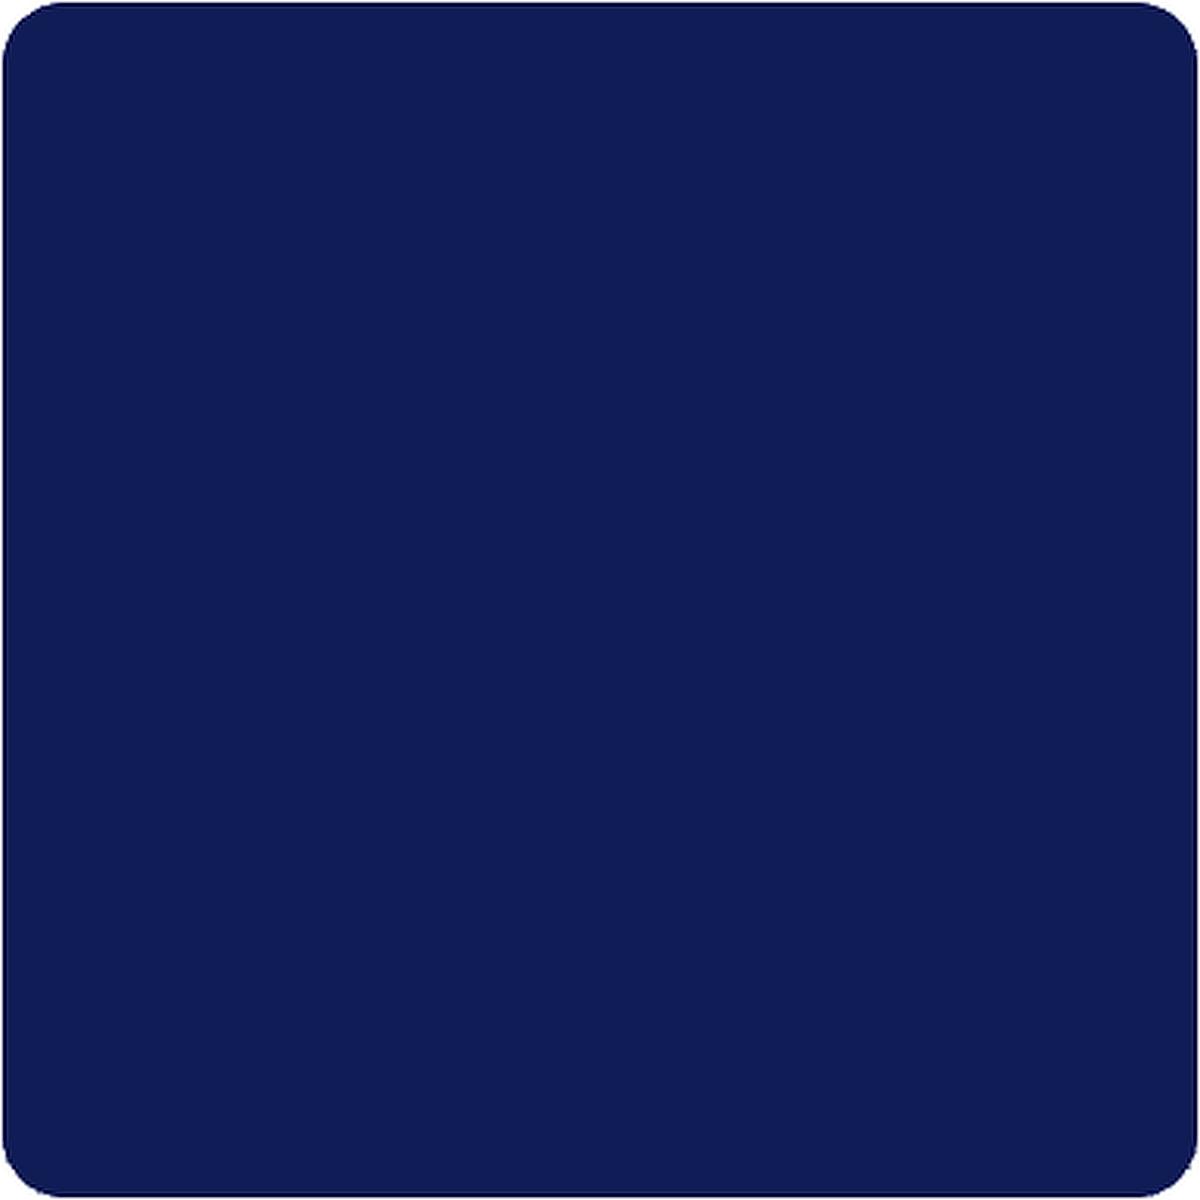 Acrylic varnish, sapphire blue, 2 in 1, silky matt